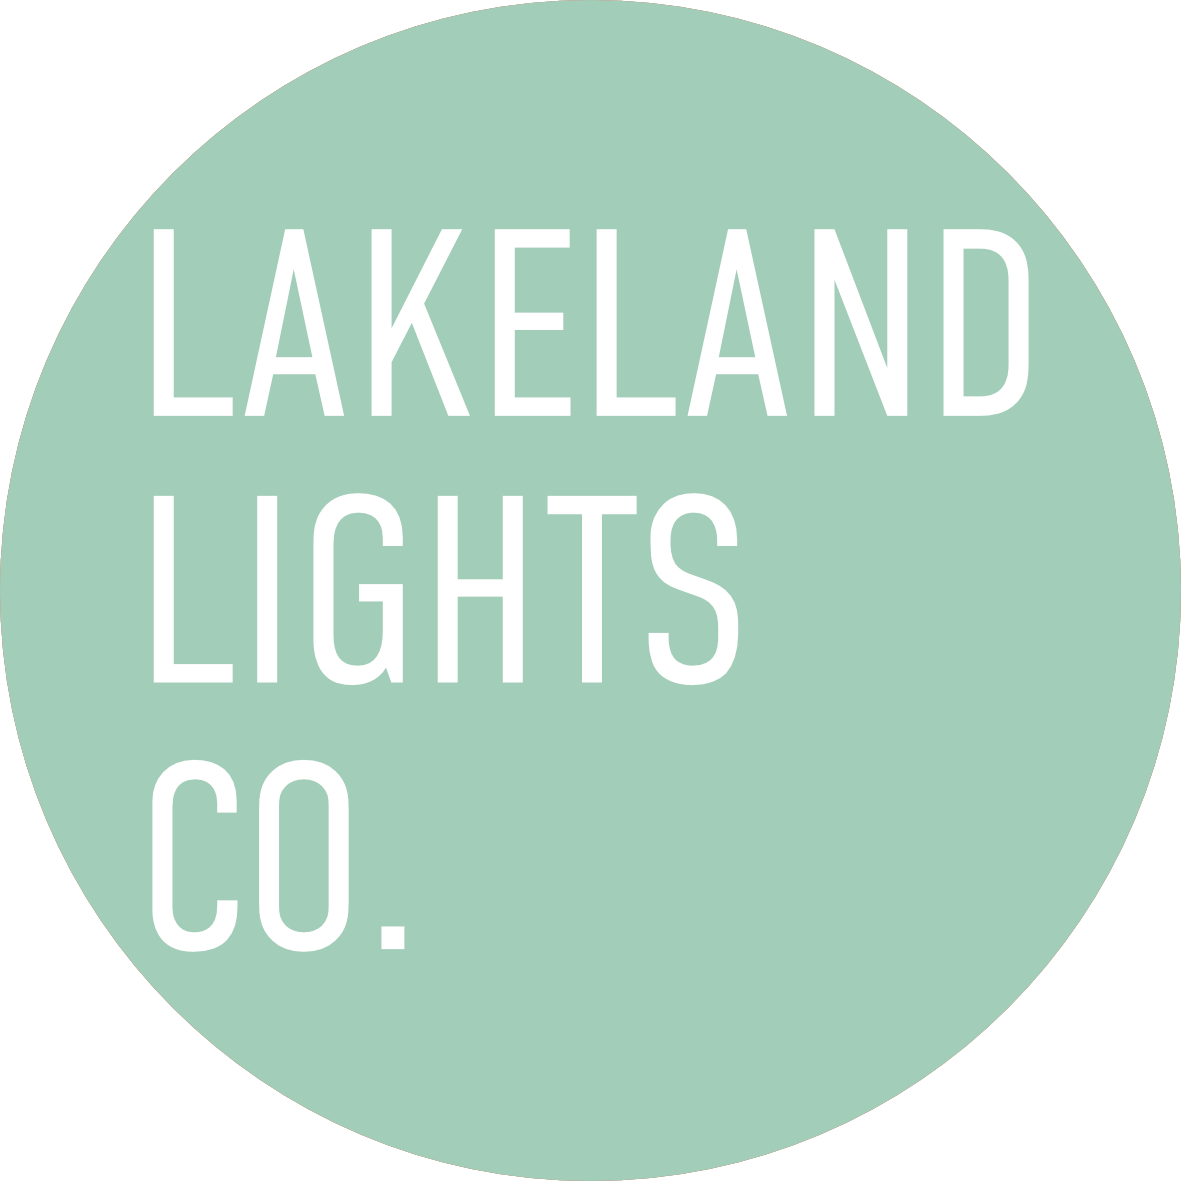 LAKELAND LIGHTS COMPANY LTD